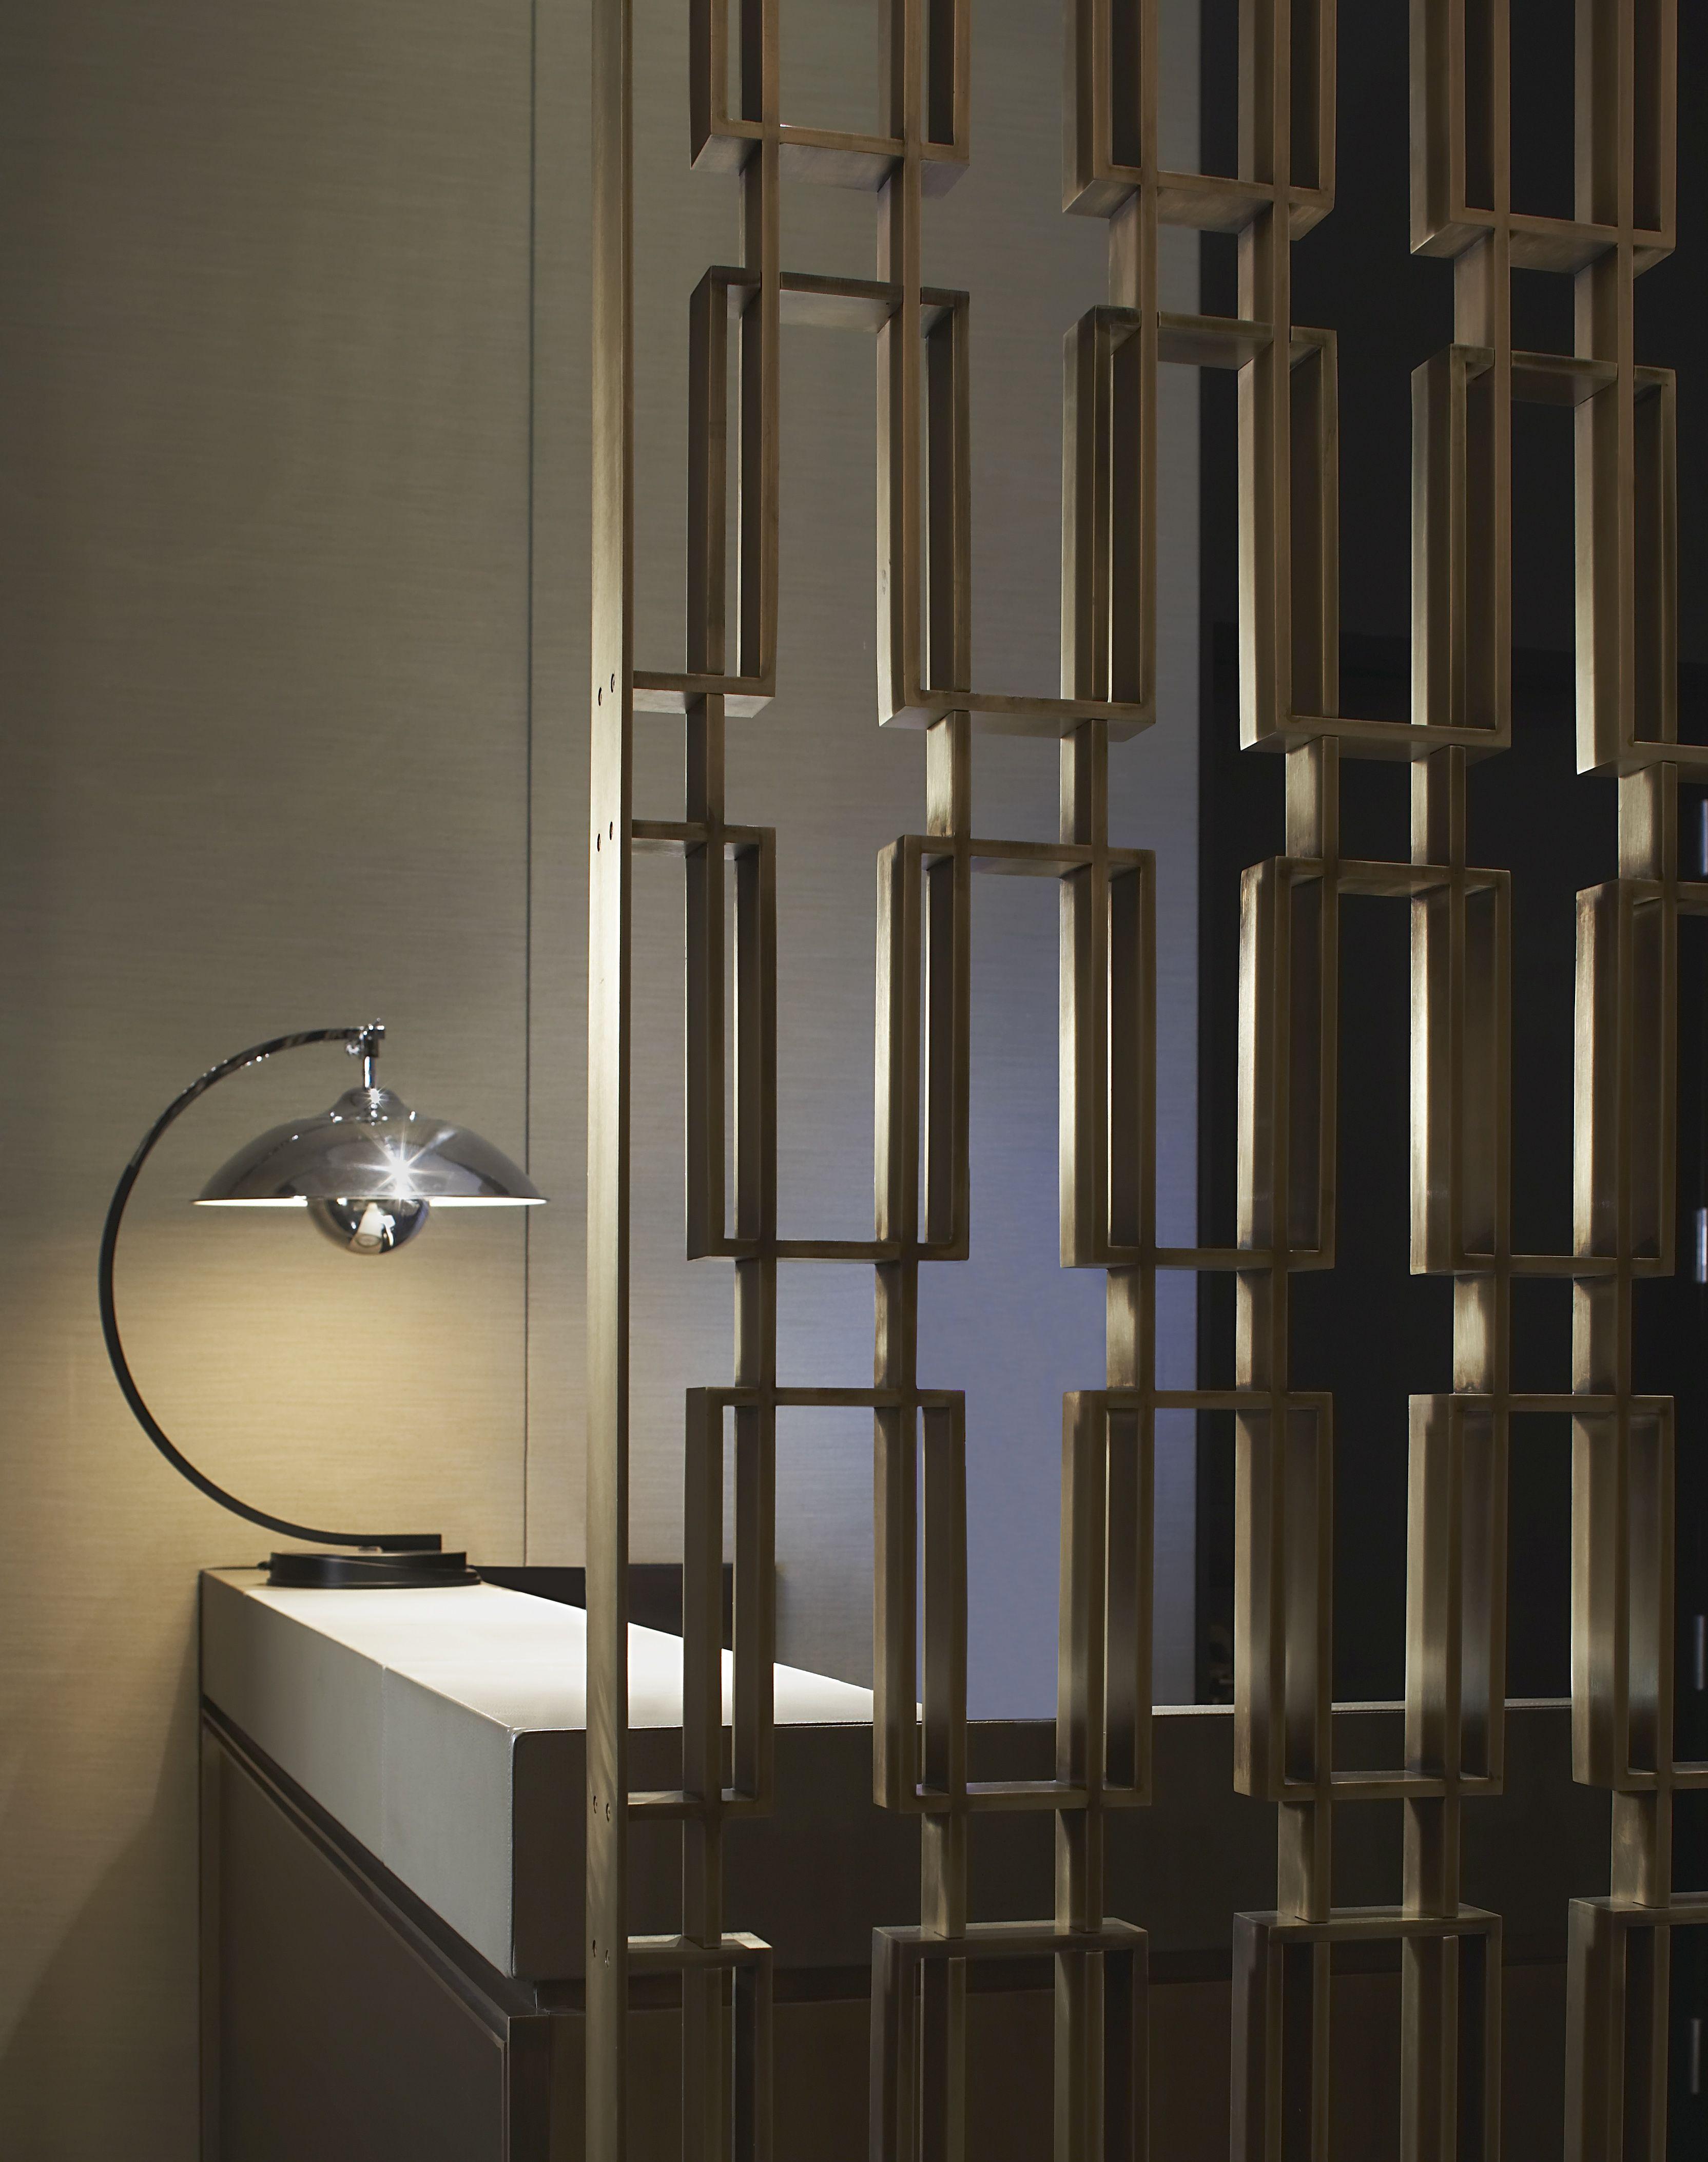 Yabu pushelberg hotels office peg pinterest screens divider